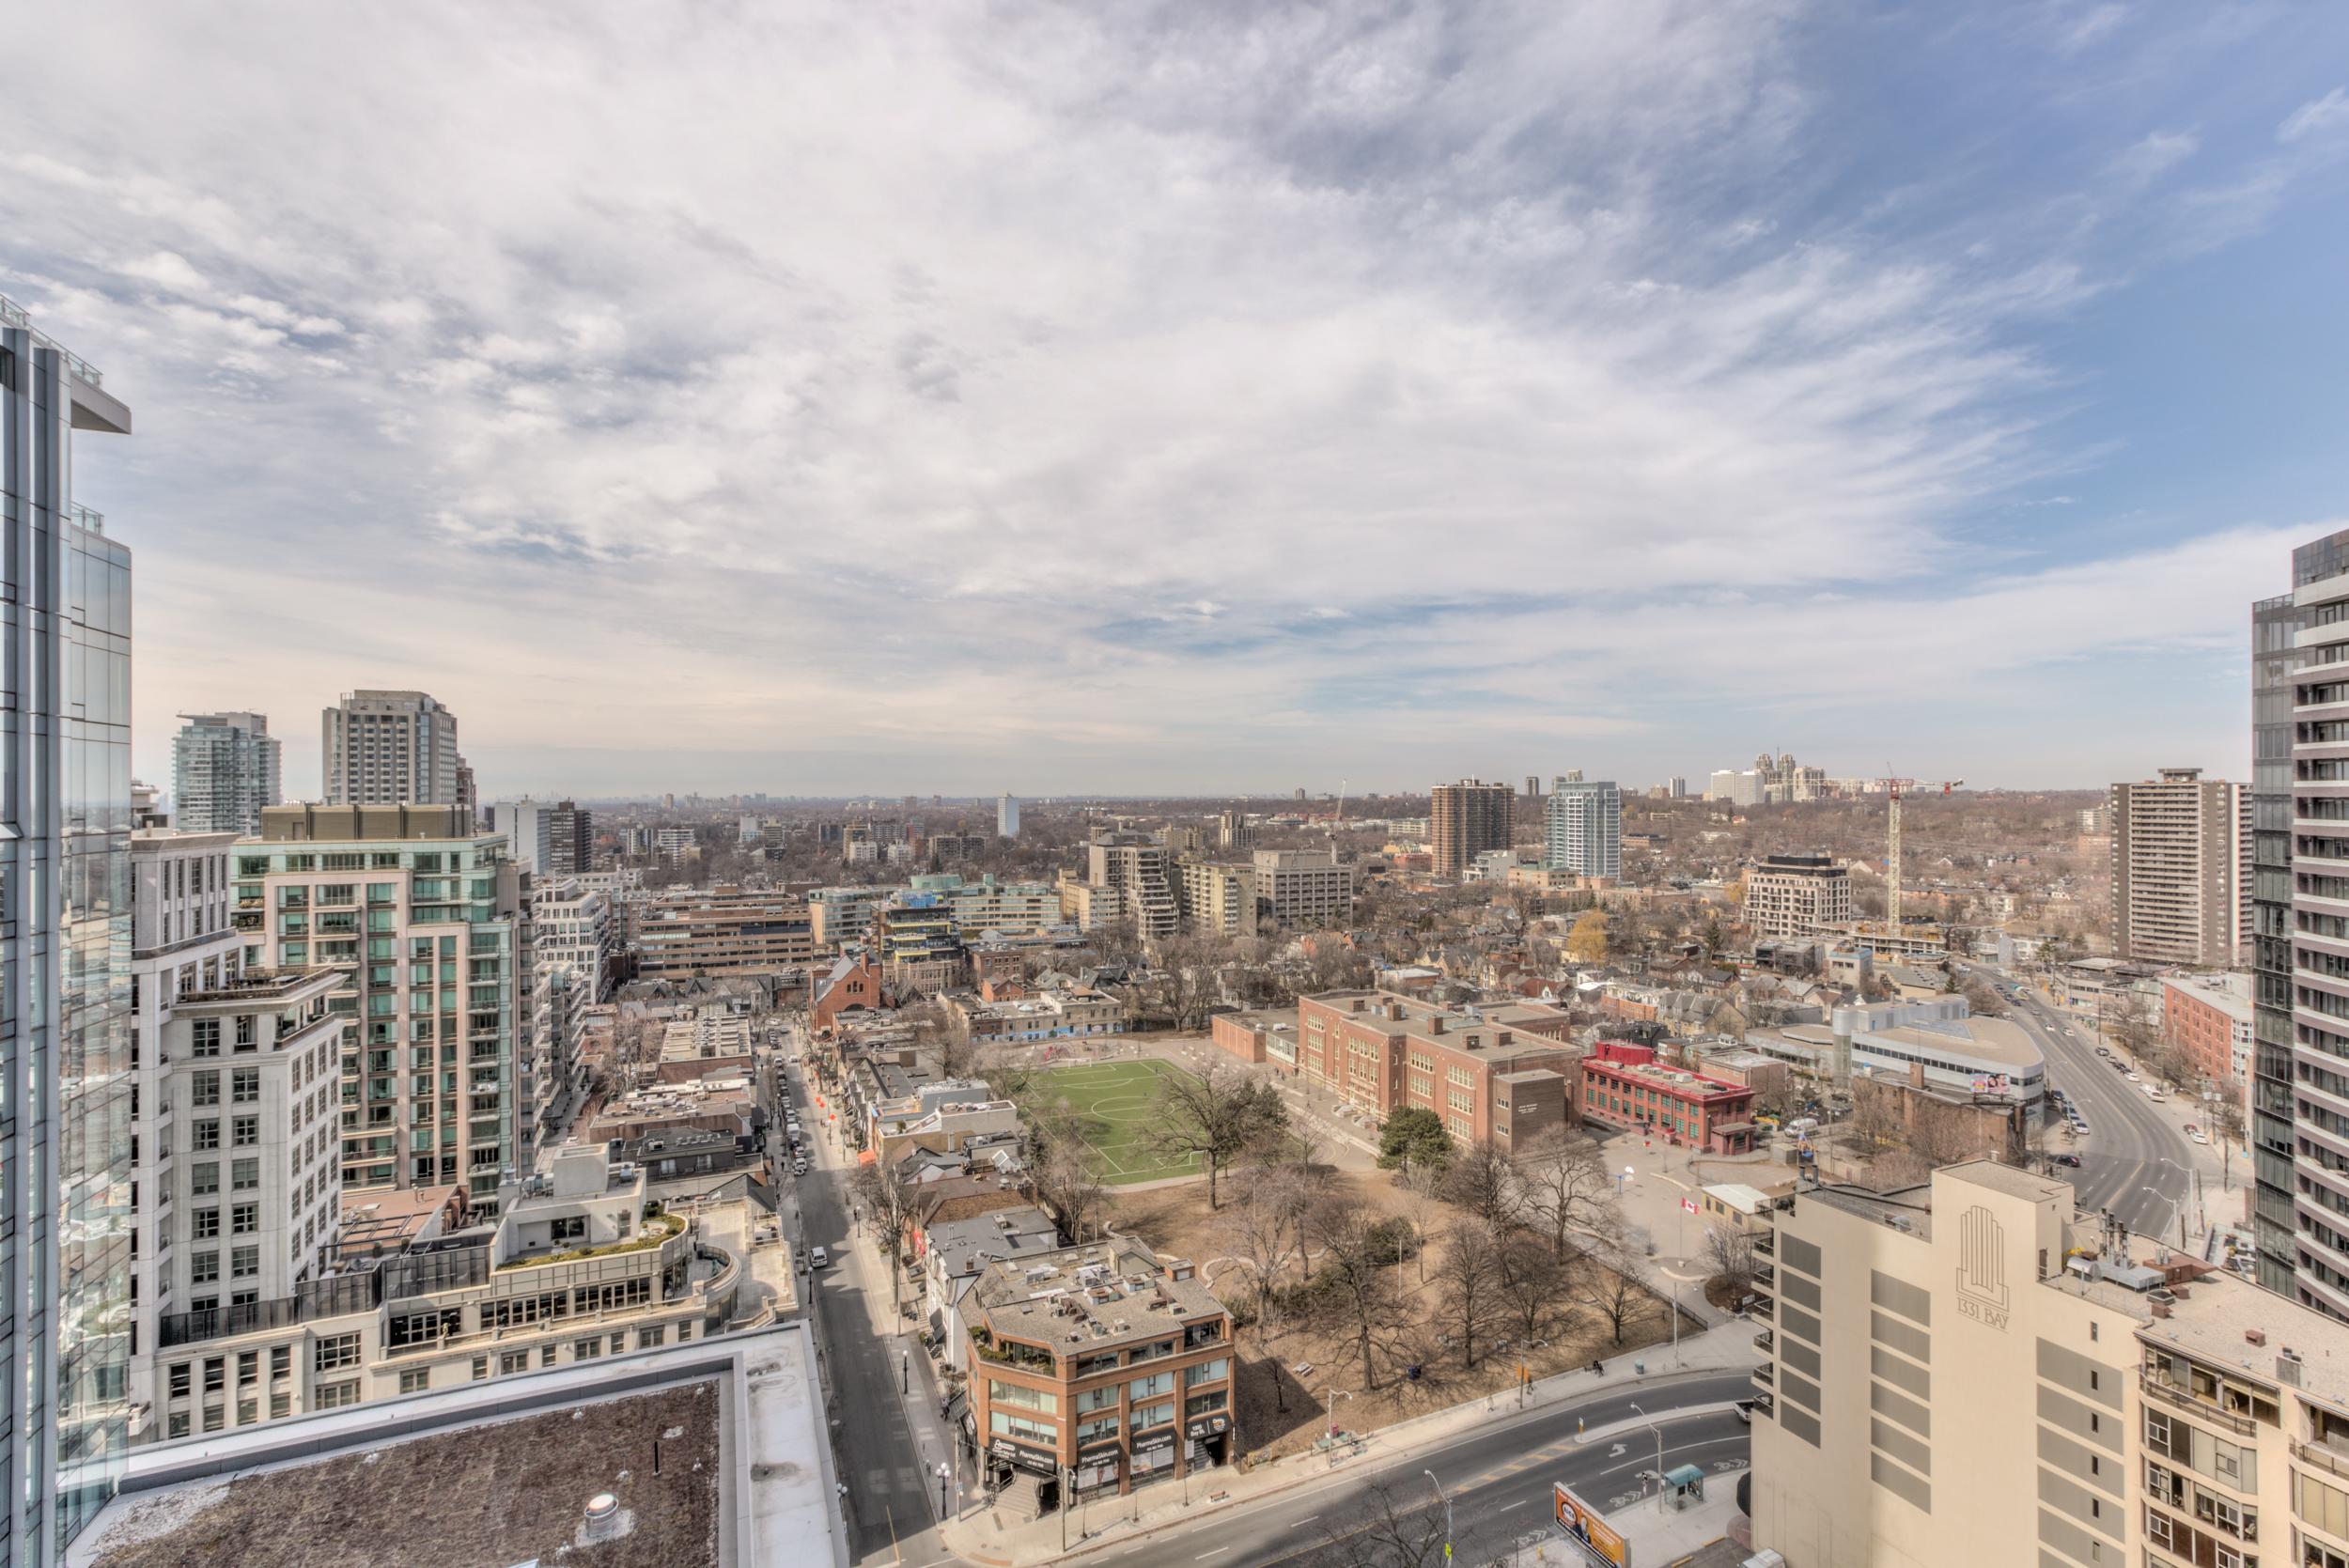 Кооперативная квартира для того Продажа на Four Season Private Residences 55 Scollard Street, Suite 2001 Toronto, Онтарио M5R0A1 Канада